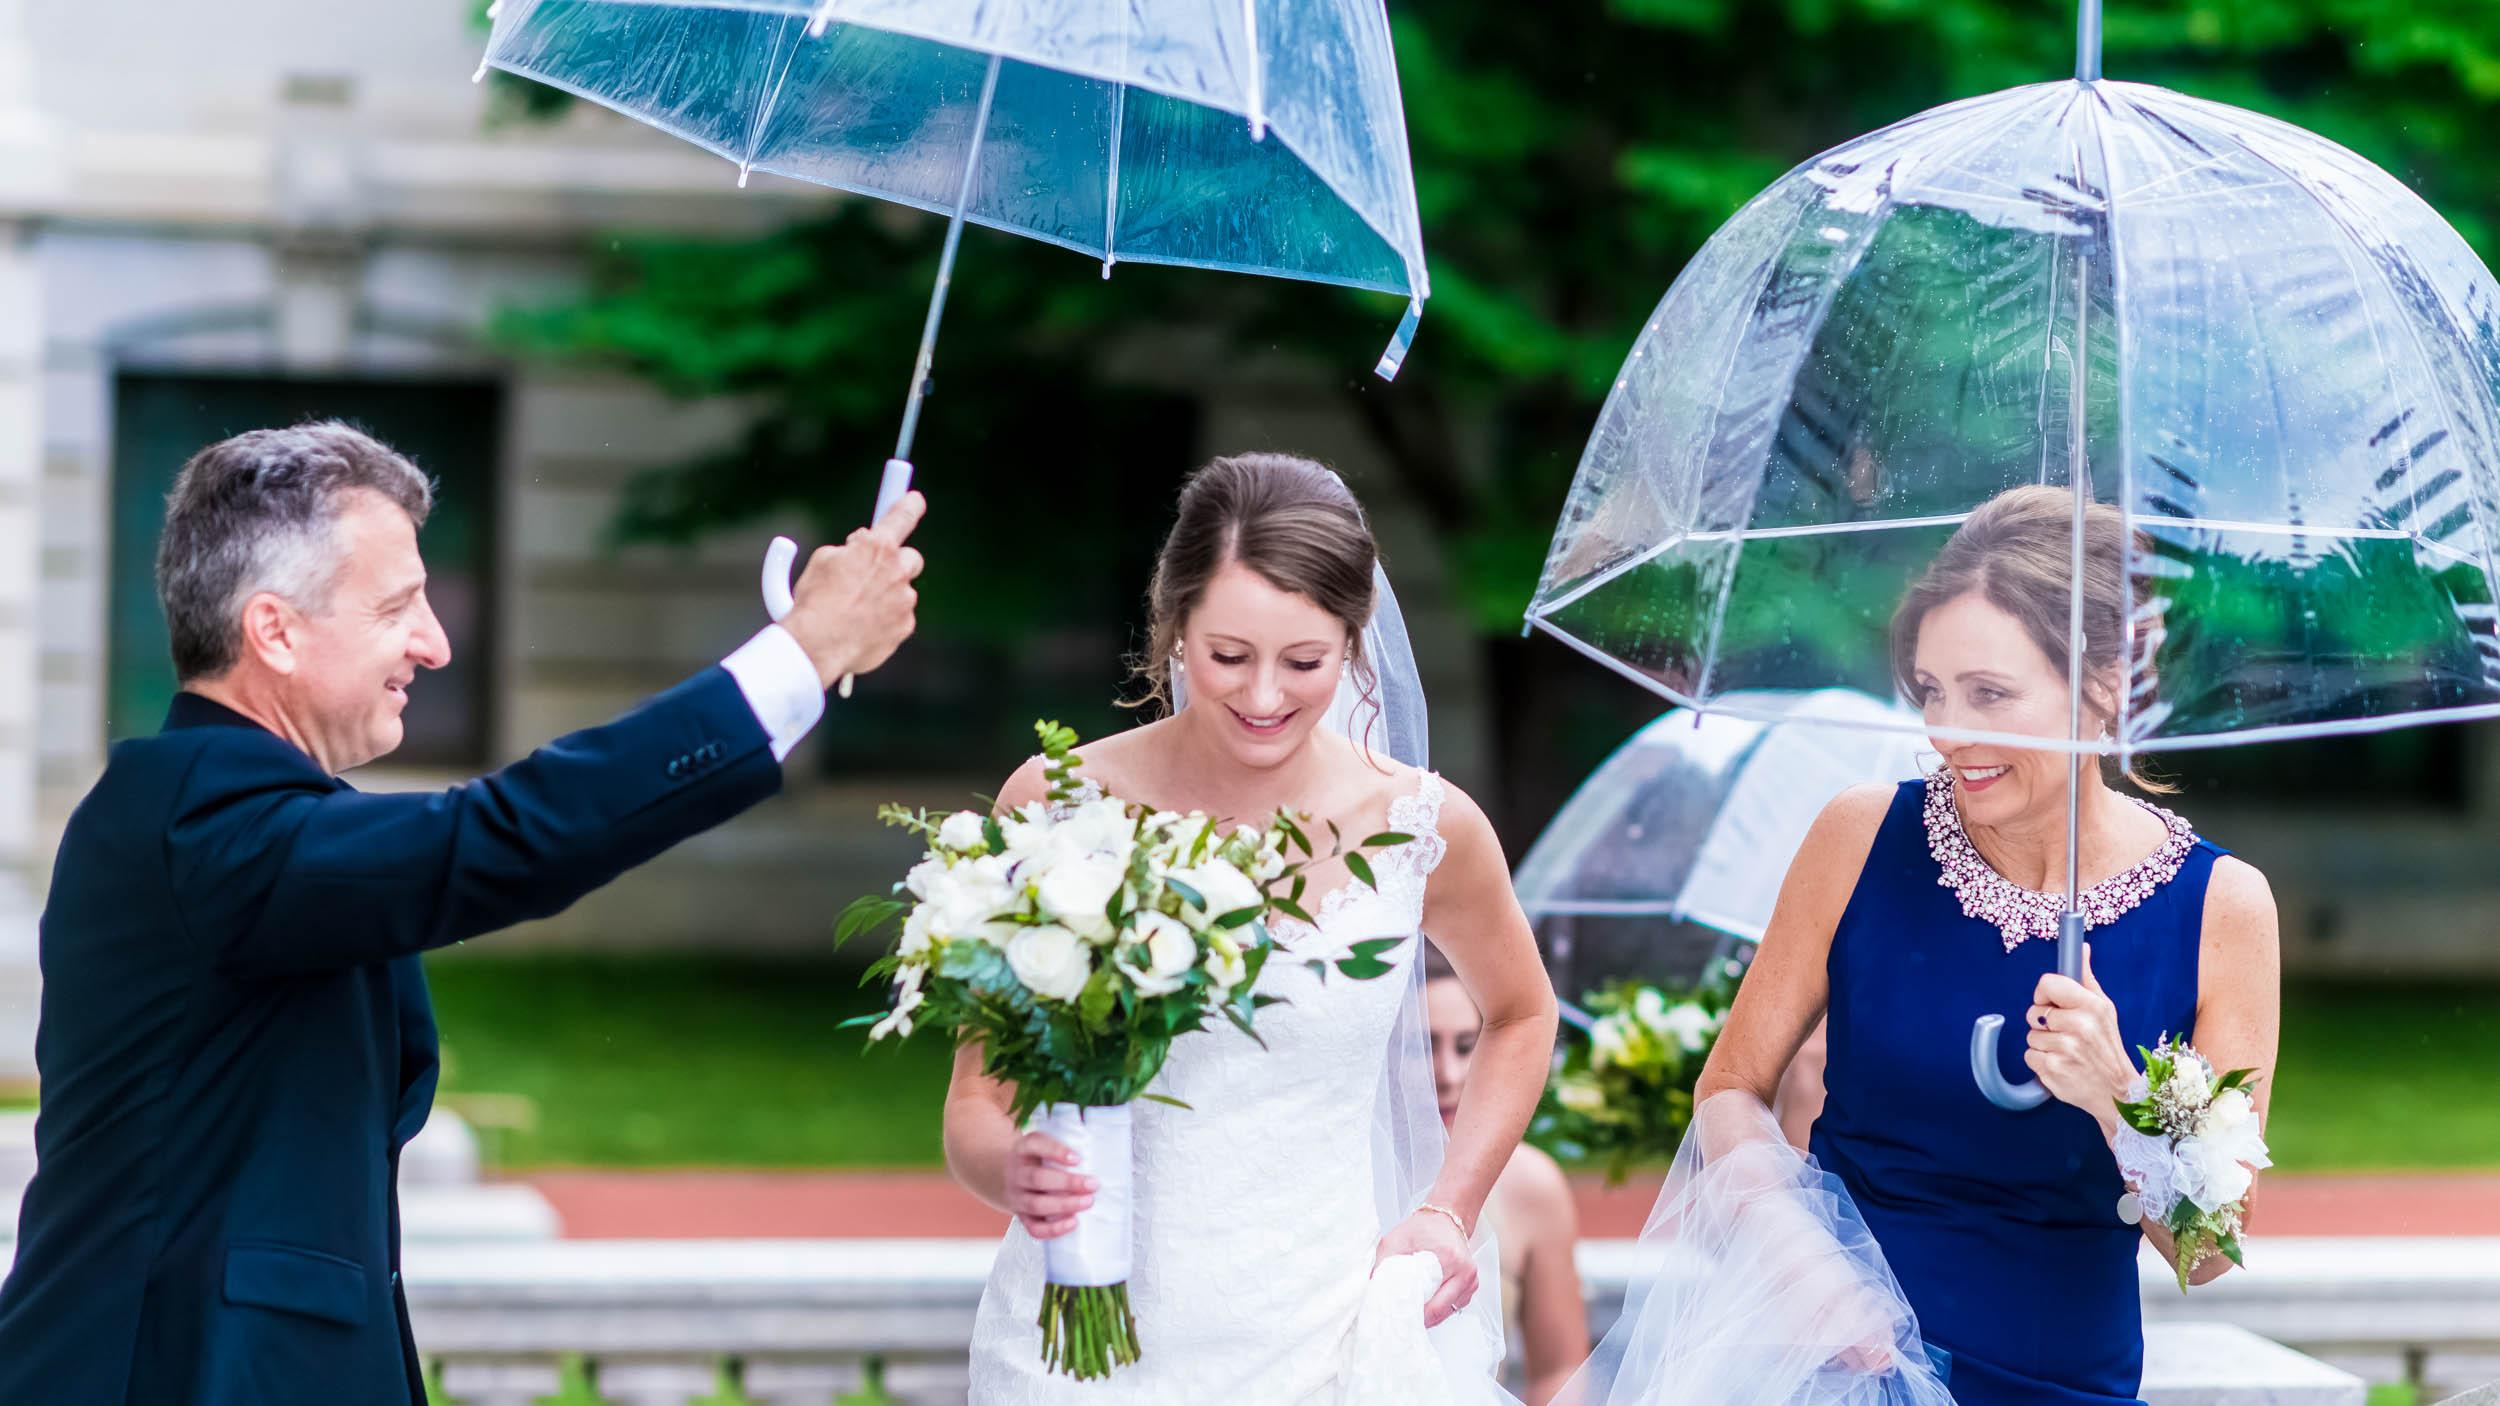 dc+metro+wedding+photographer+vadym+guliuk+photography+wedding+bride-2031.jpg